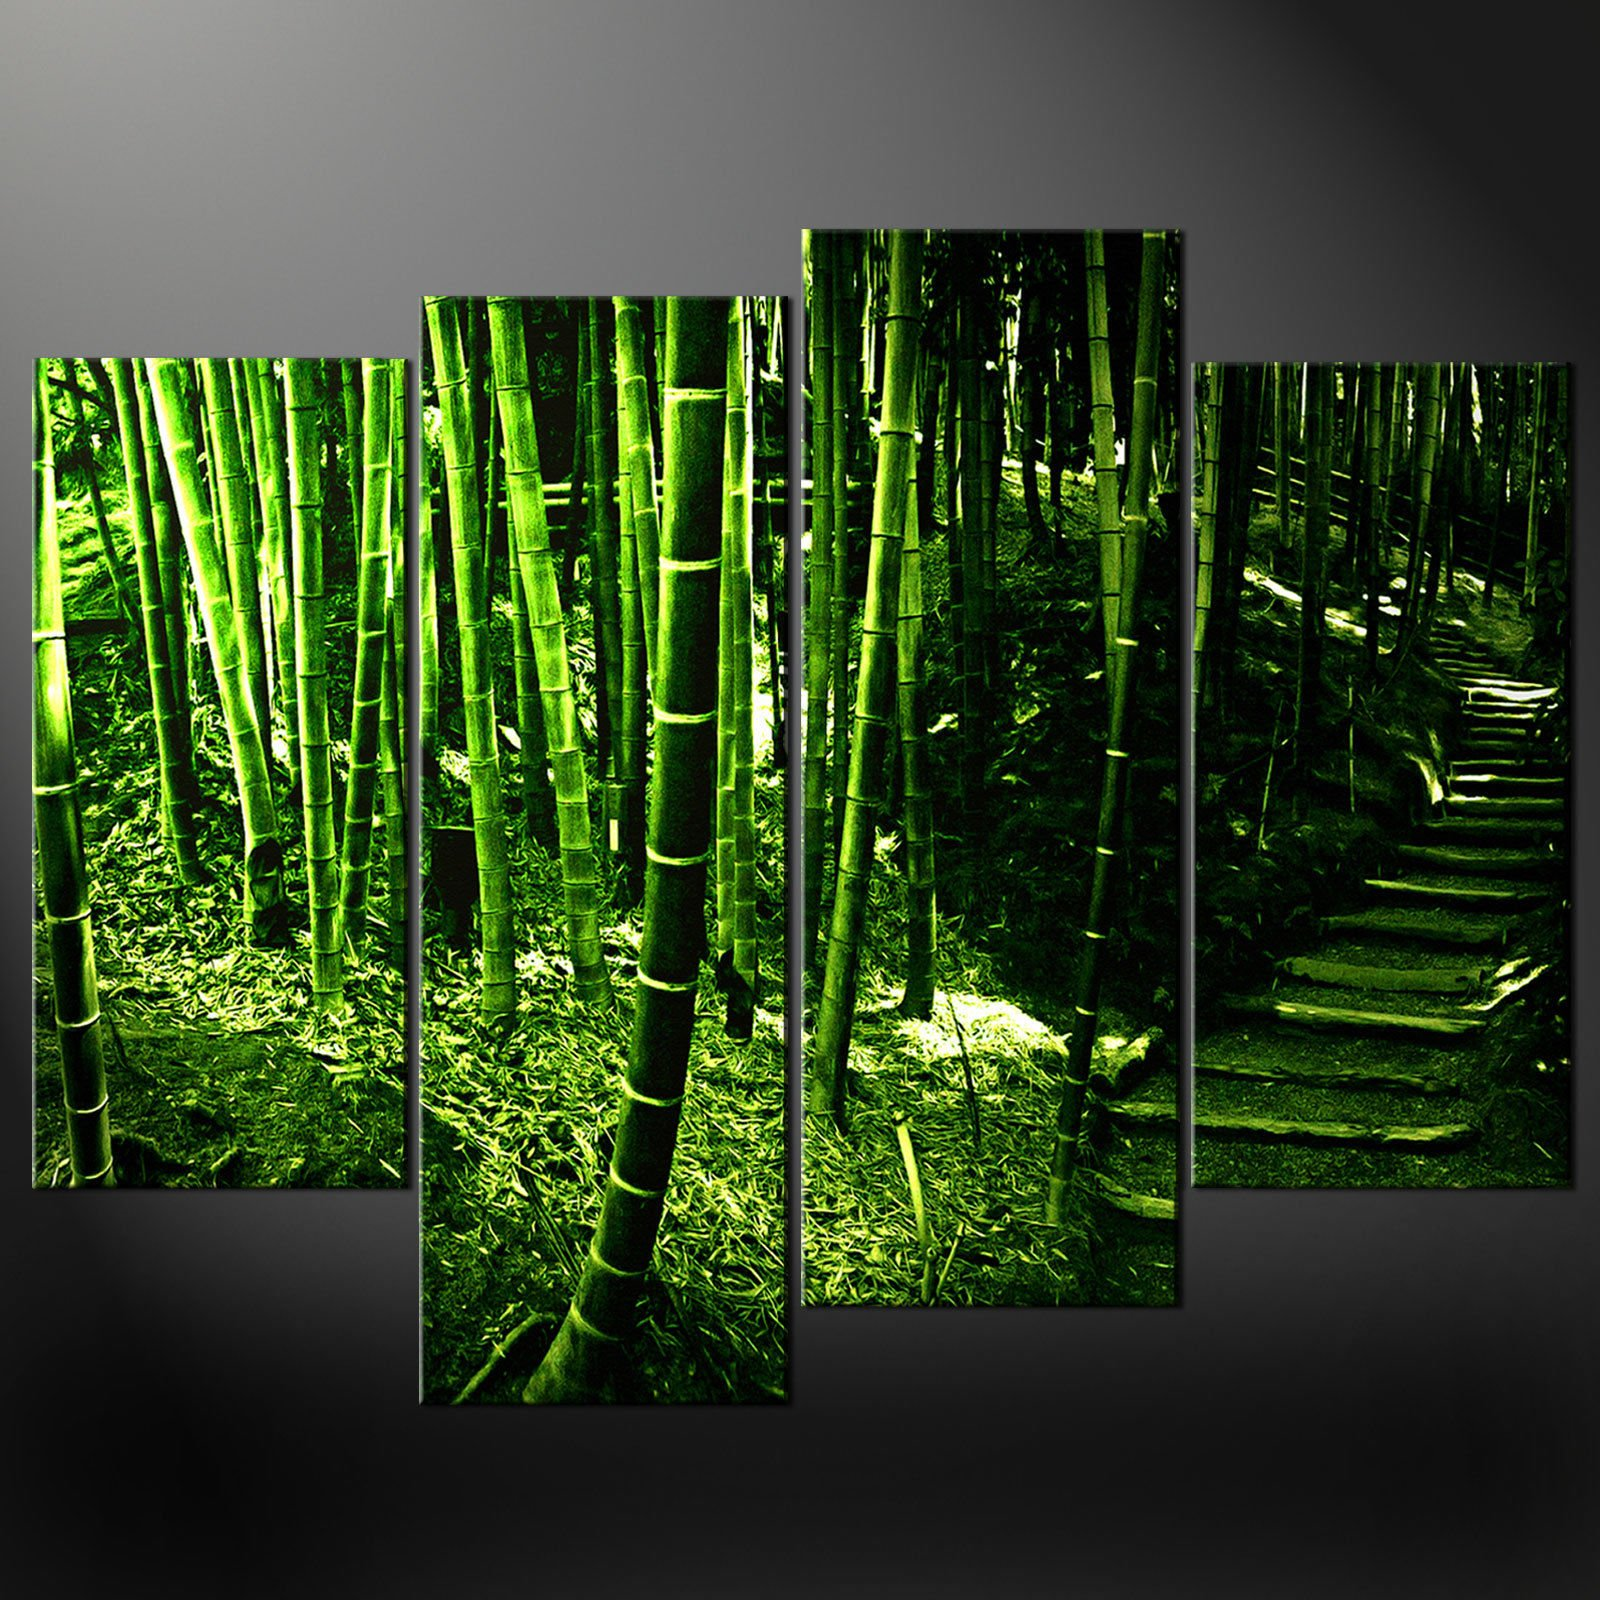 Bamboo Basket Painting